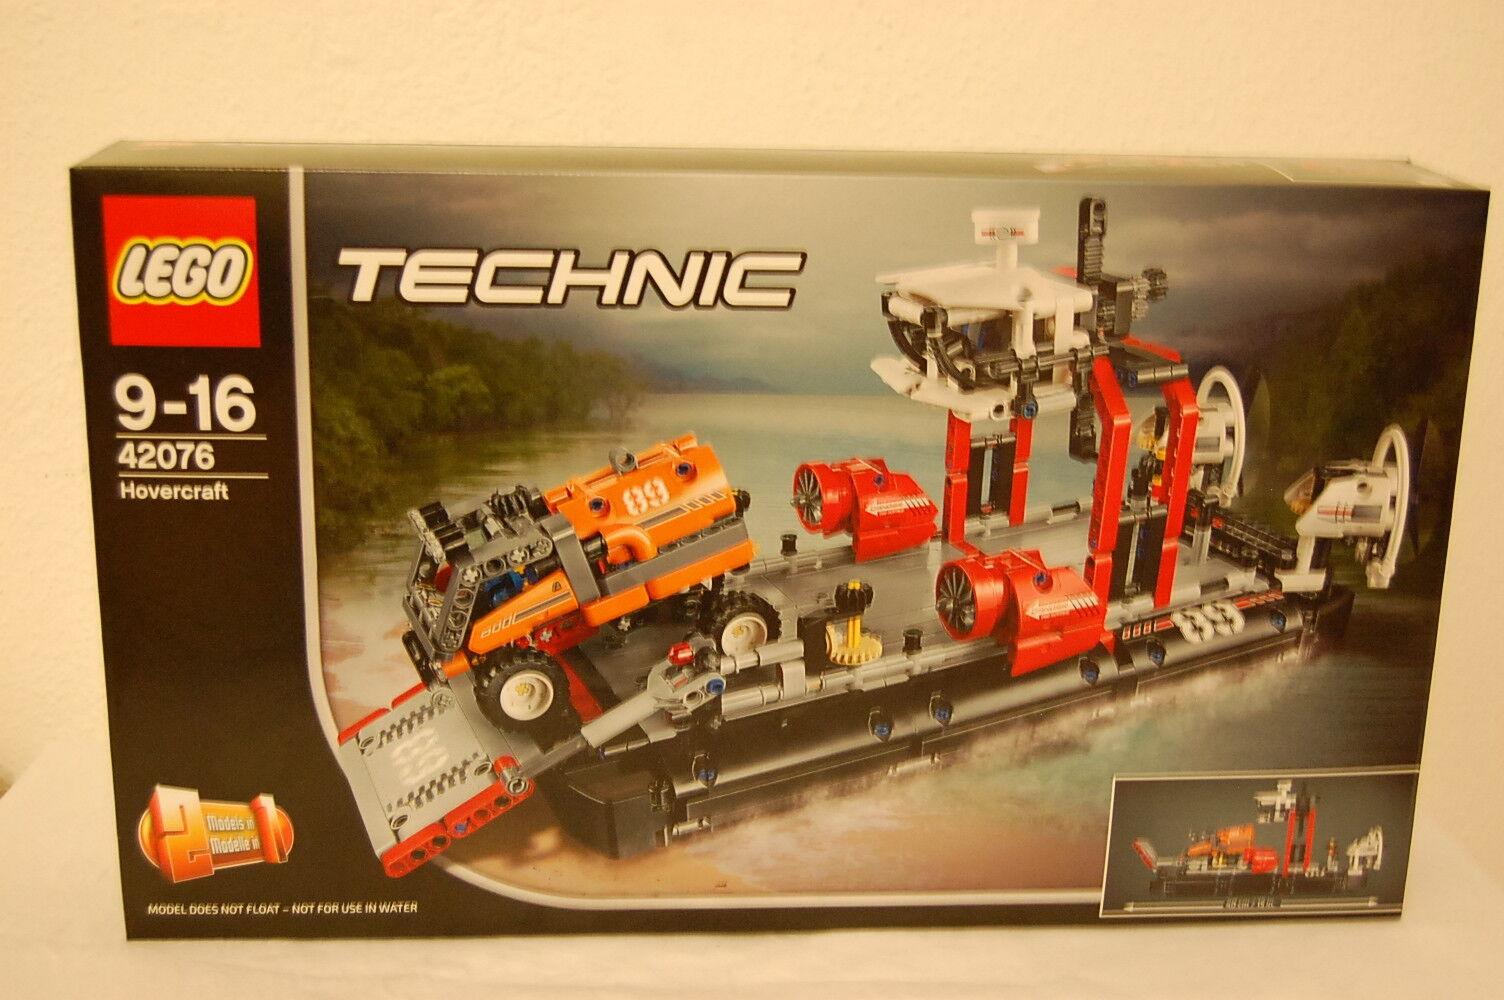 LEGO Technic 42076 LuftkissenStiefel Neu OVP